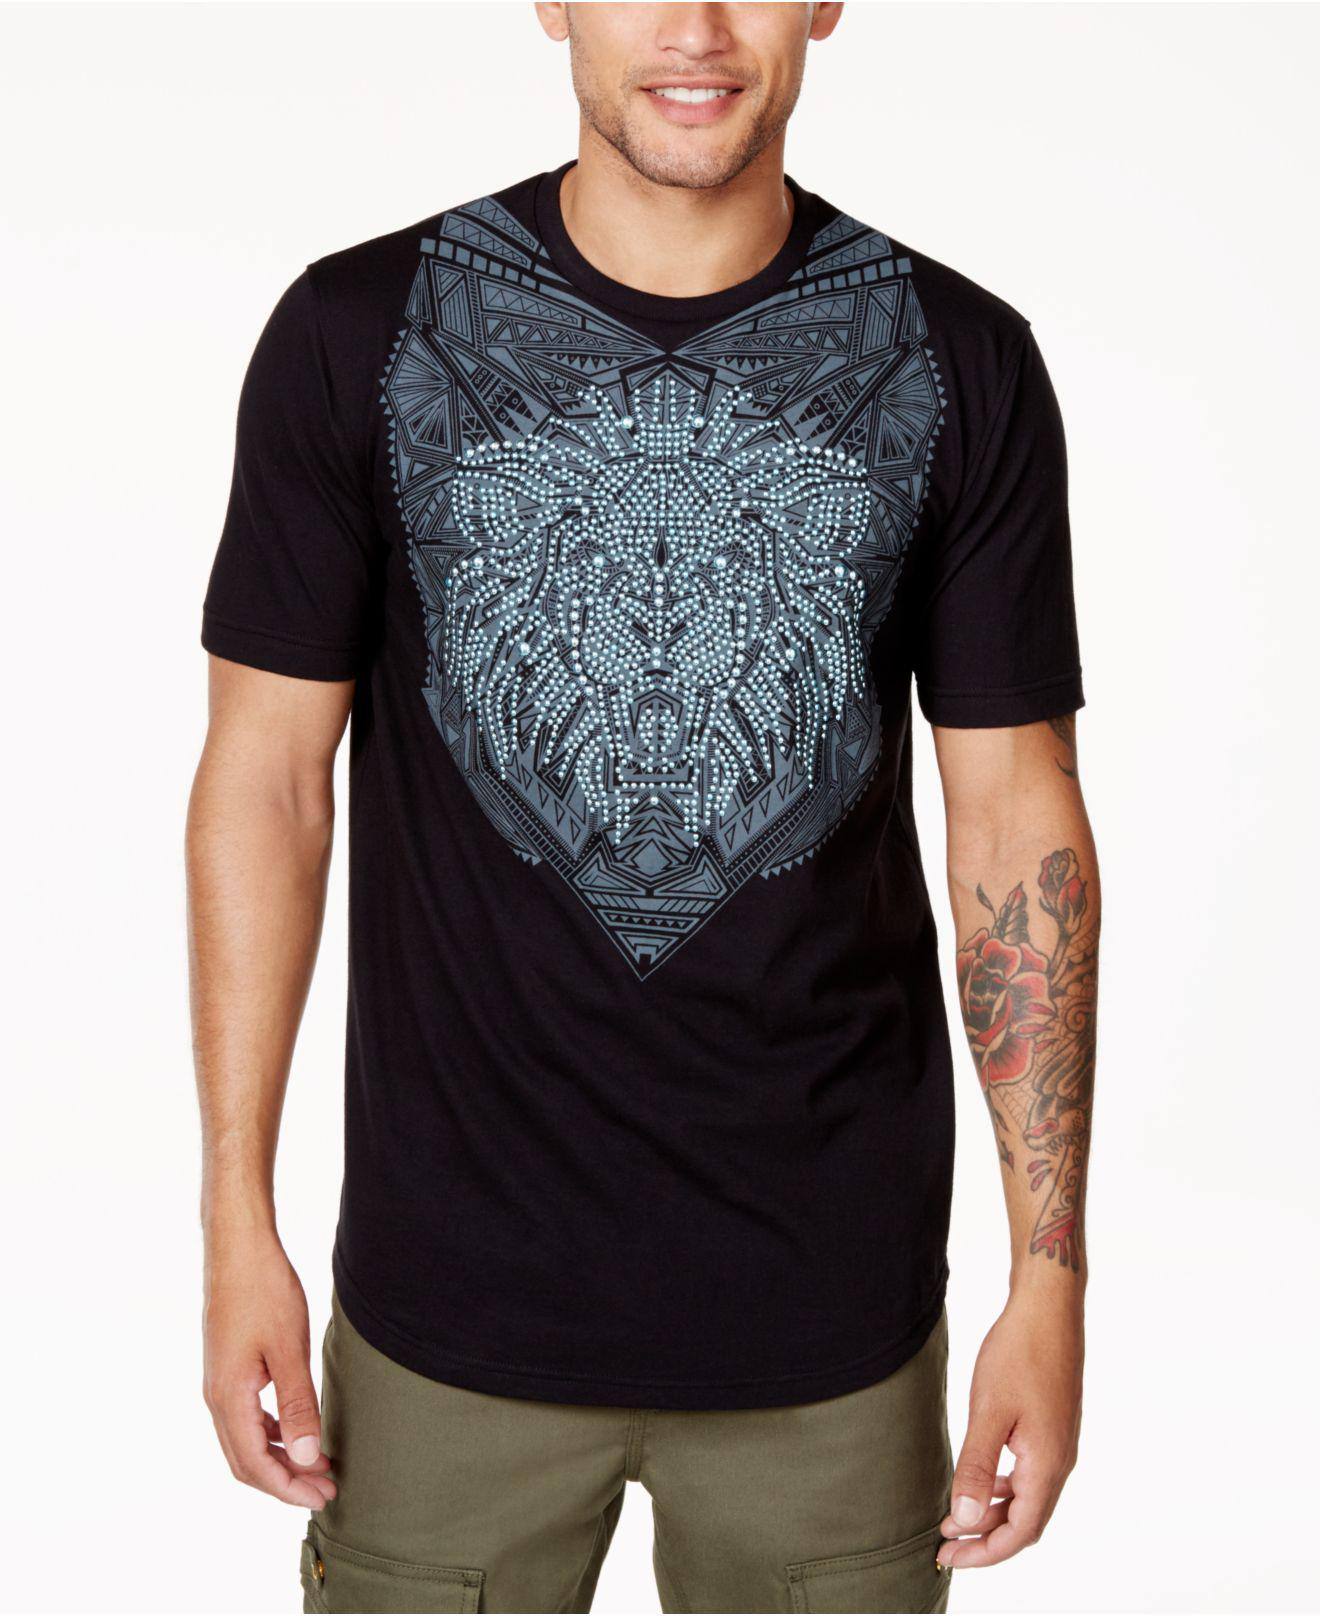 a3c5e5376 Sean John Men's Valiant Lion Rhinestone Graphic-print T-shirt in ...